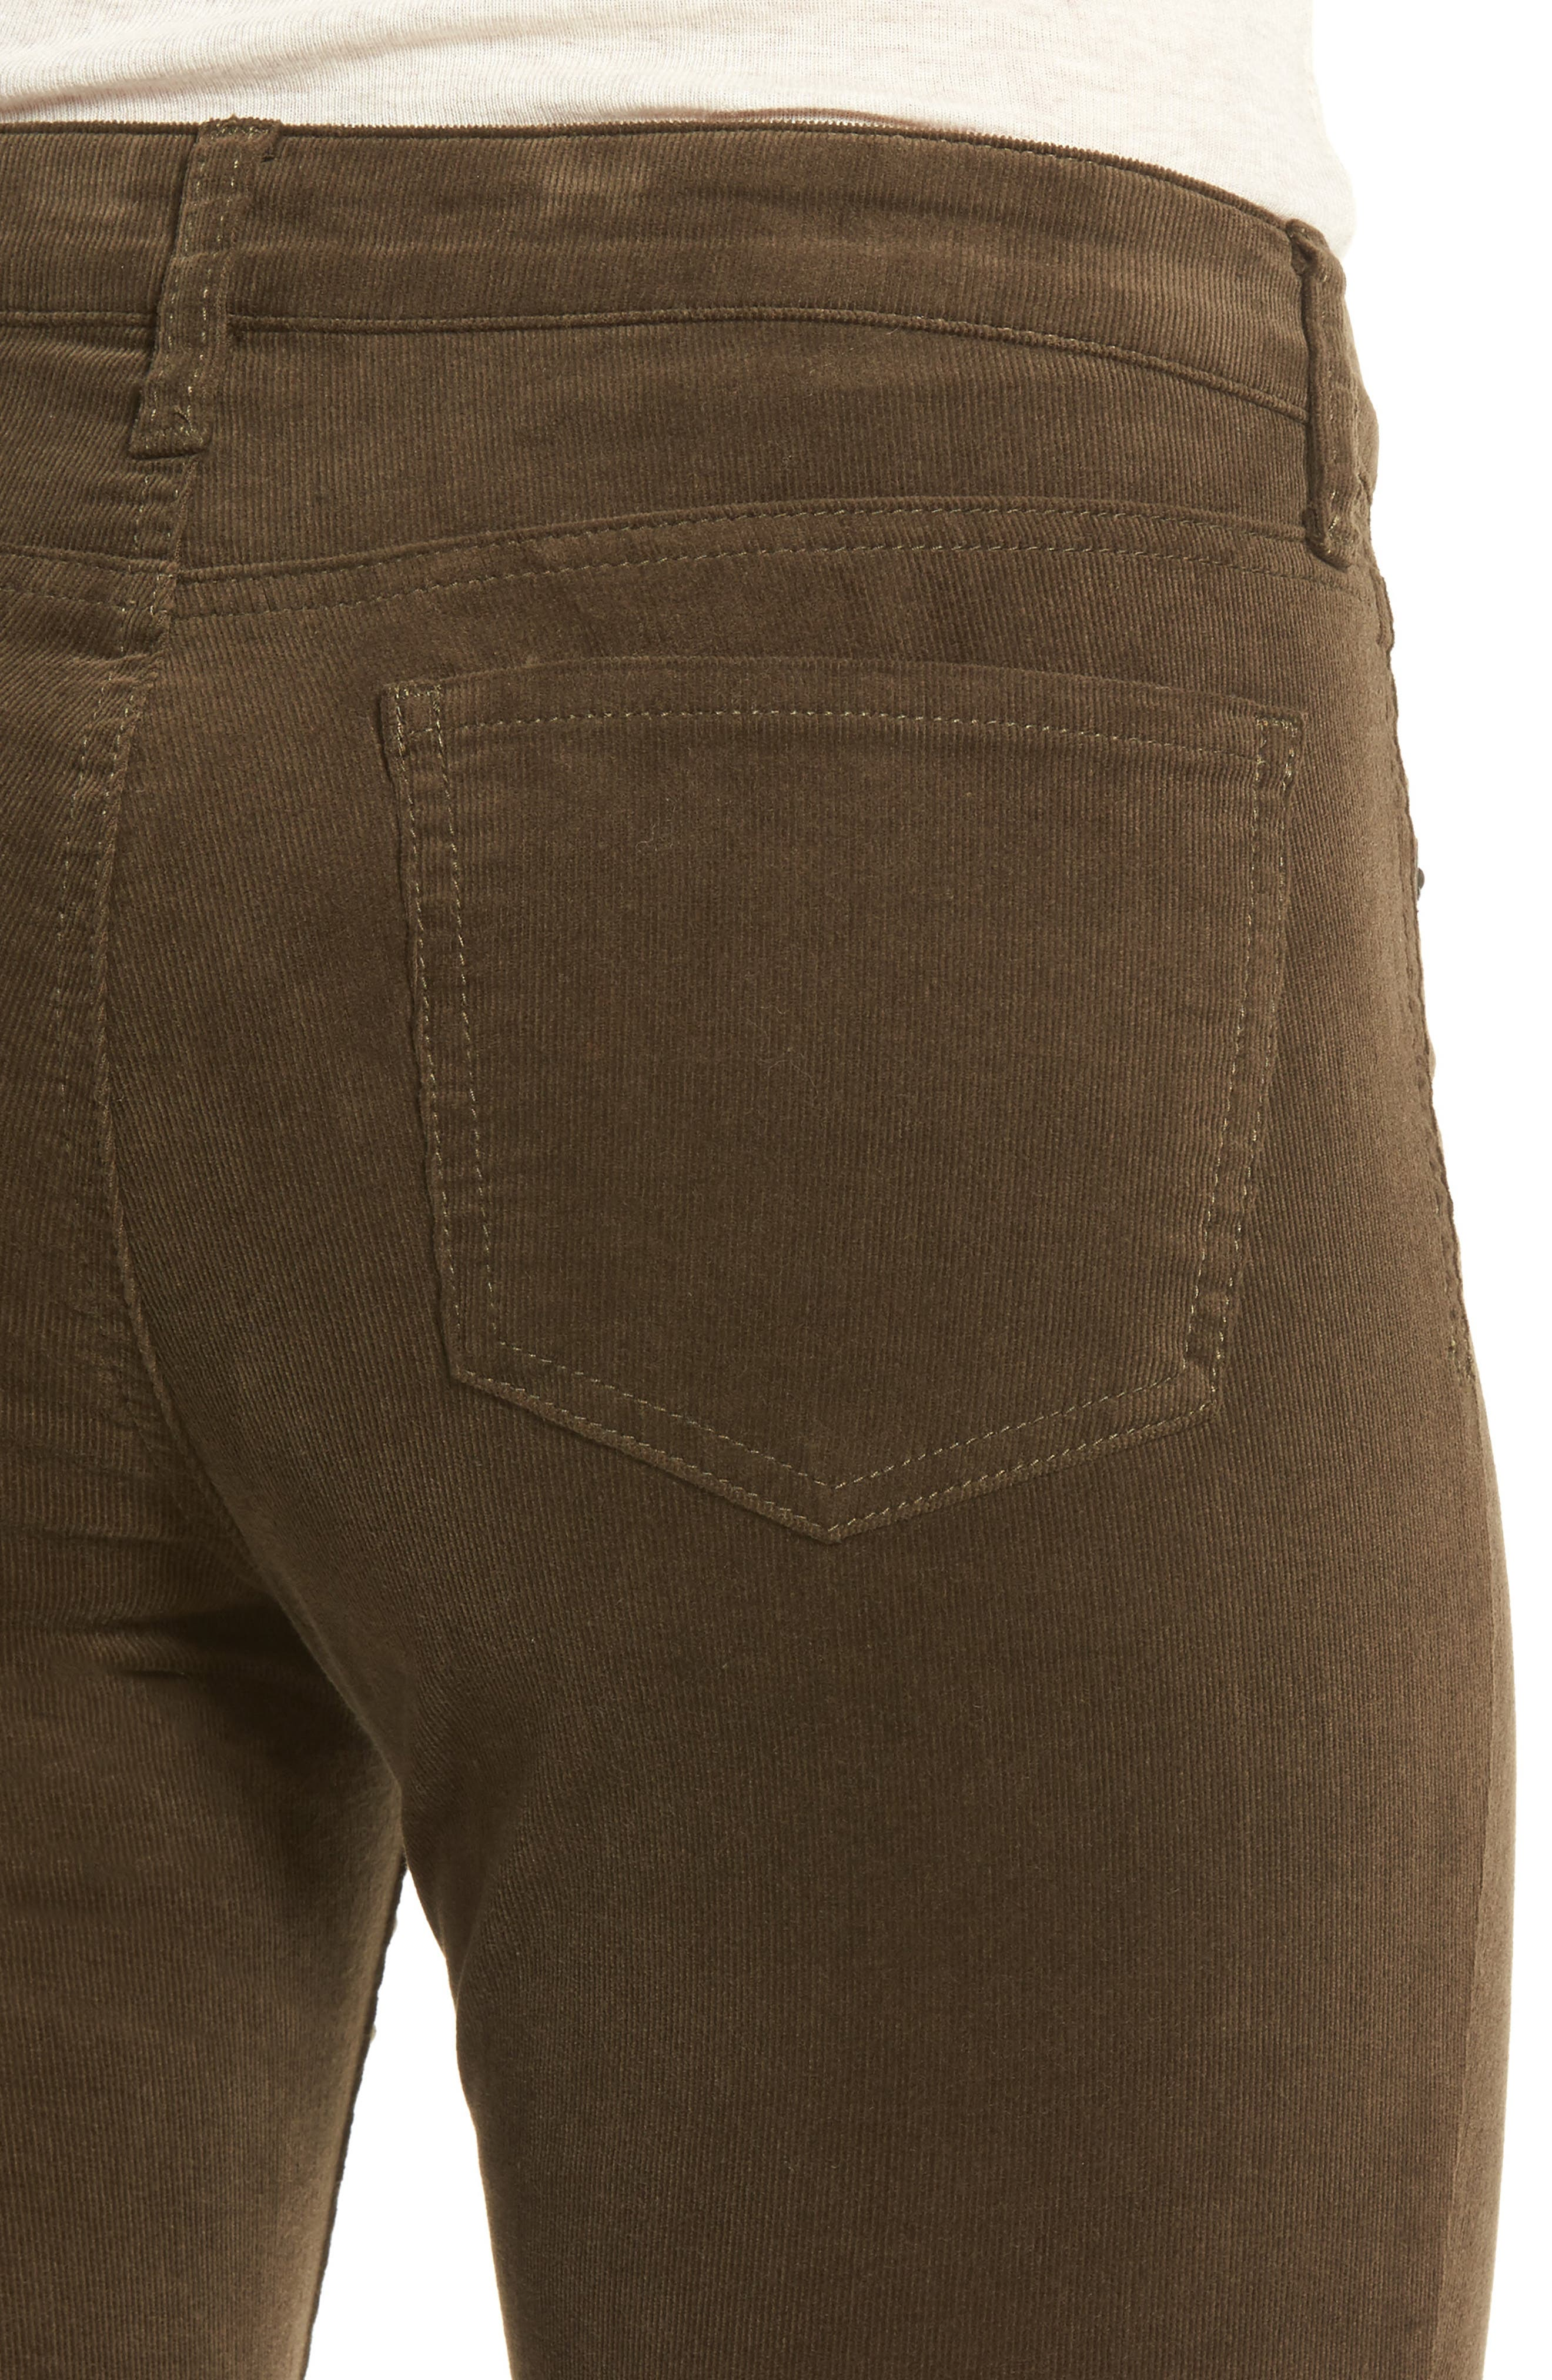 'Diana' Stretch Corduroy Skinny Pants,                             Alternate thumbnail 63, color,